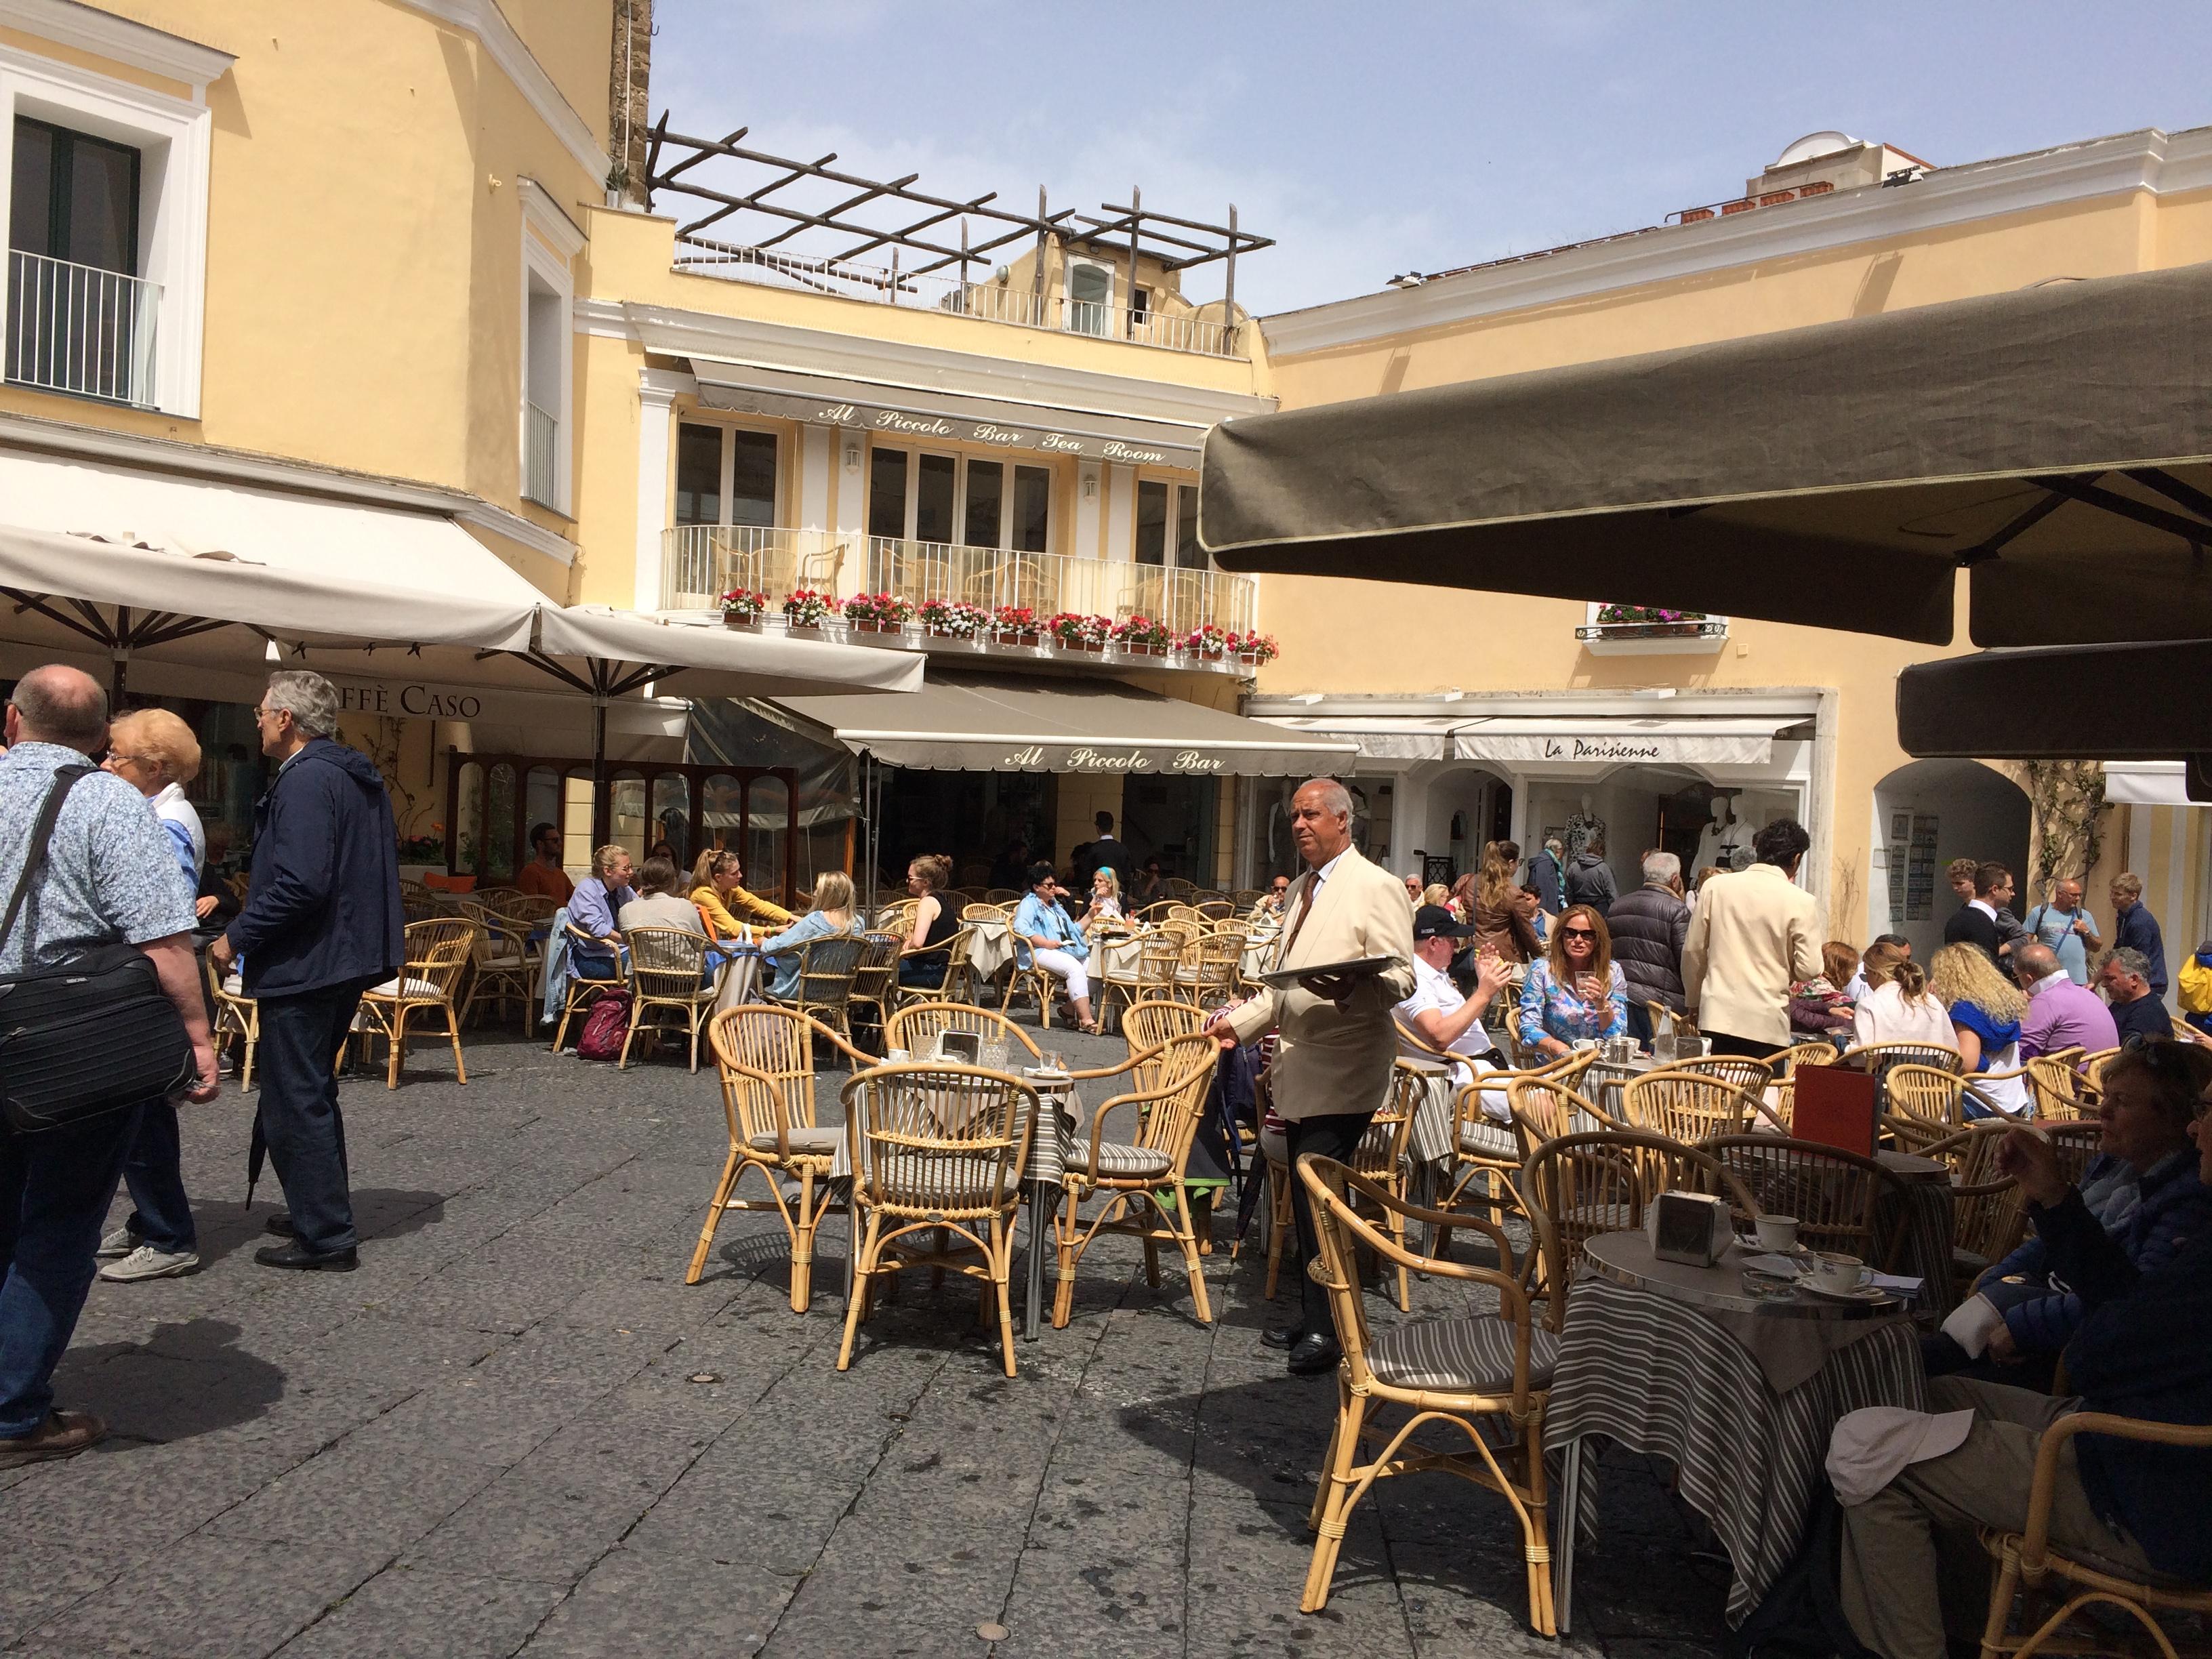 La Piazzetta - Photo: Vibes